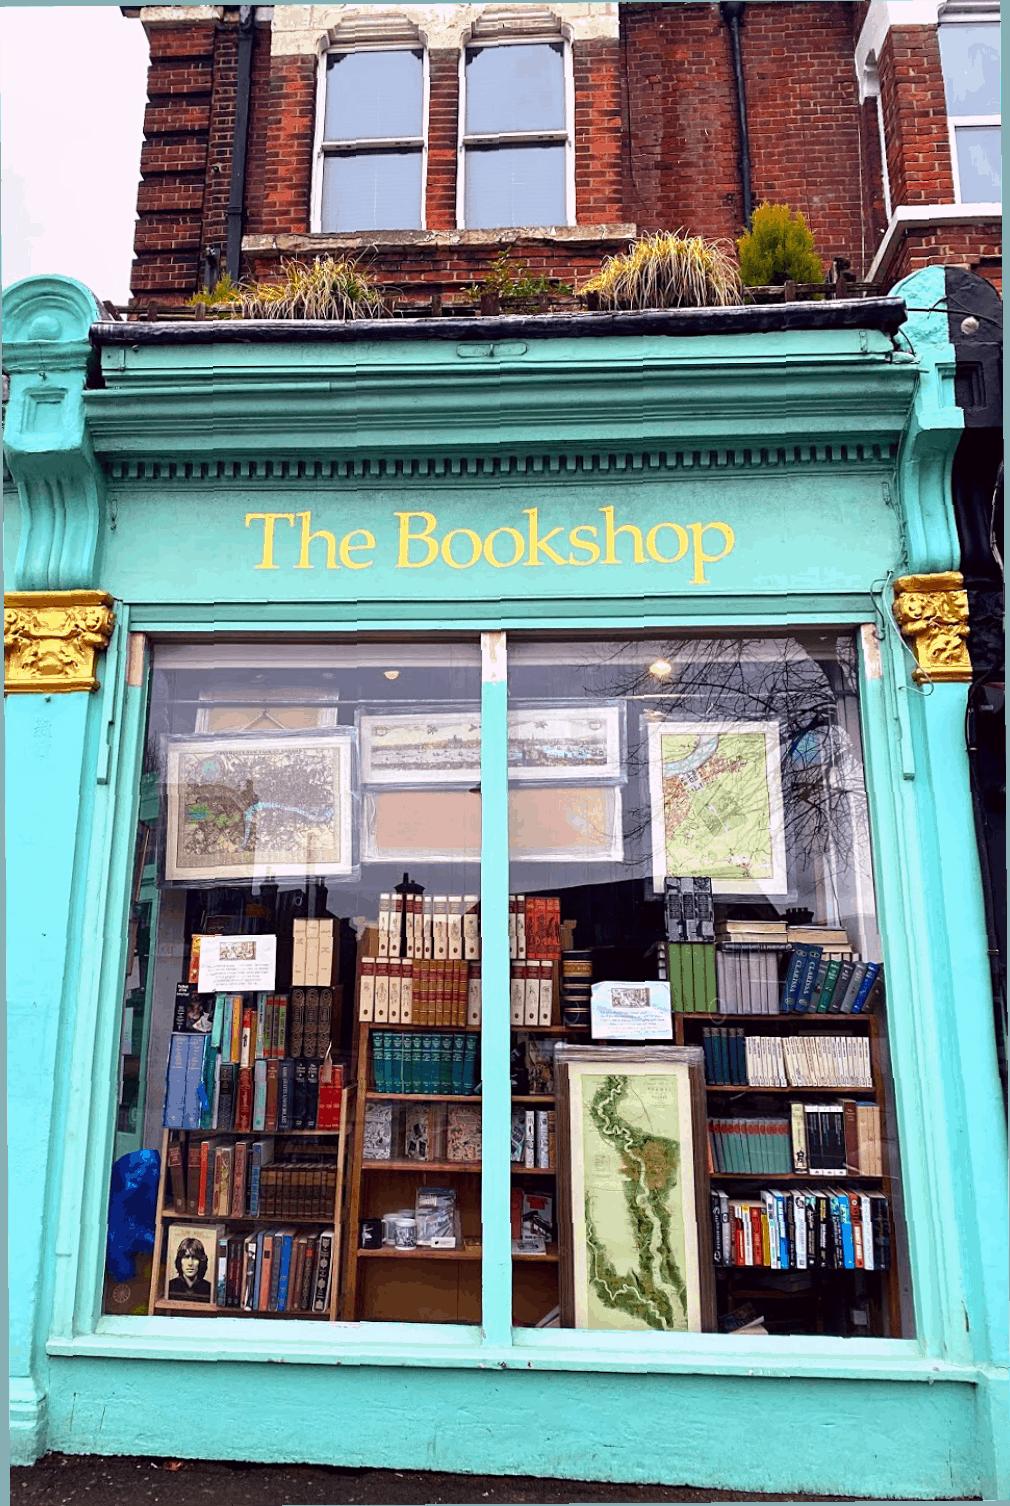 second-hand-bookshop-london-bookshop-on-the-heath